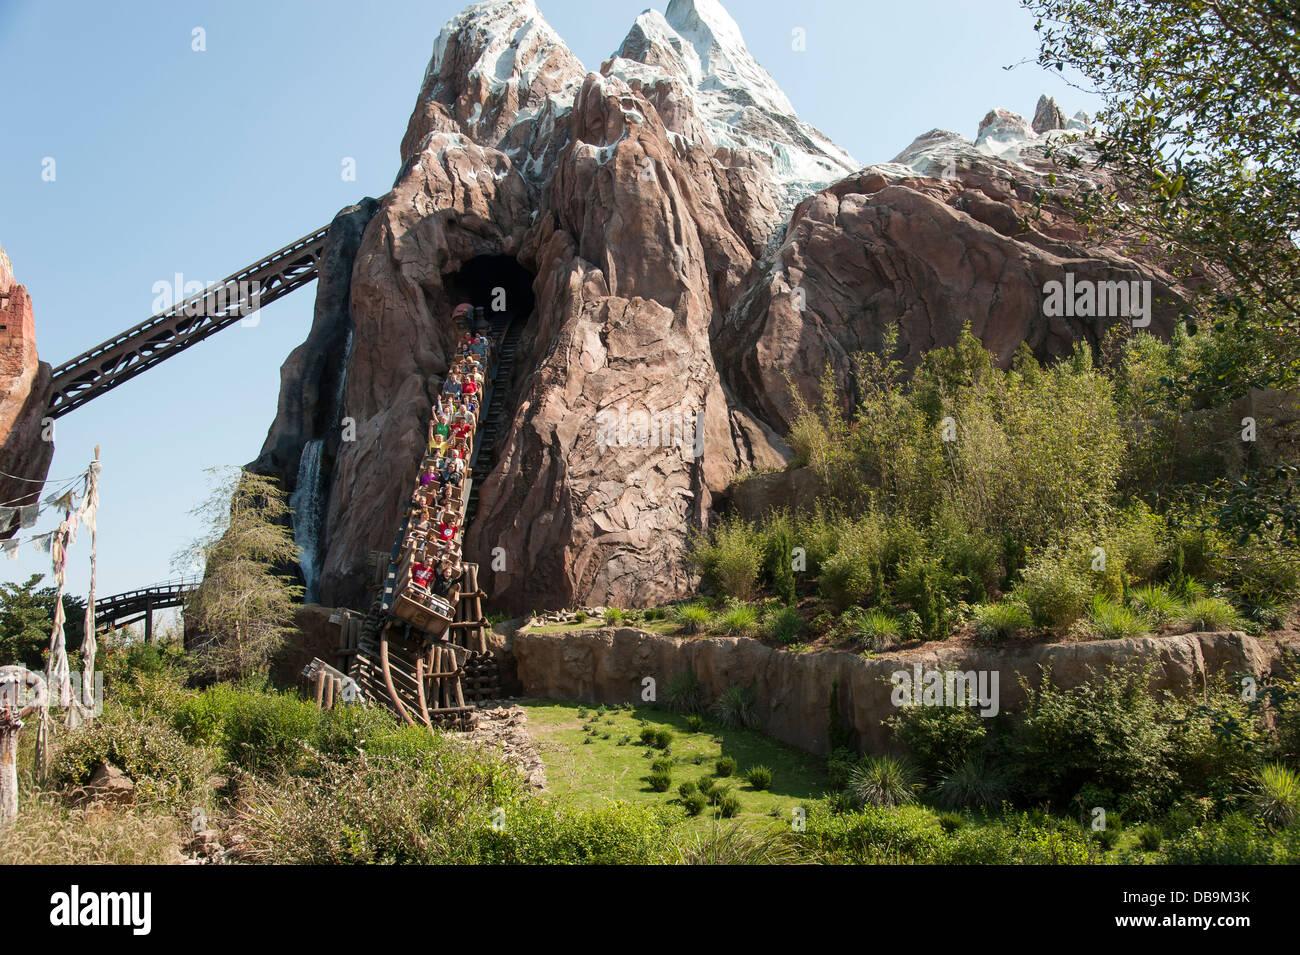 Expedition everest roller coaster at disney s animal kingdom at walt disney world resort orlando florida